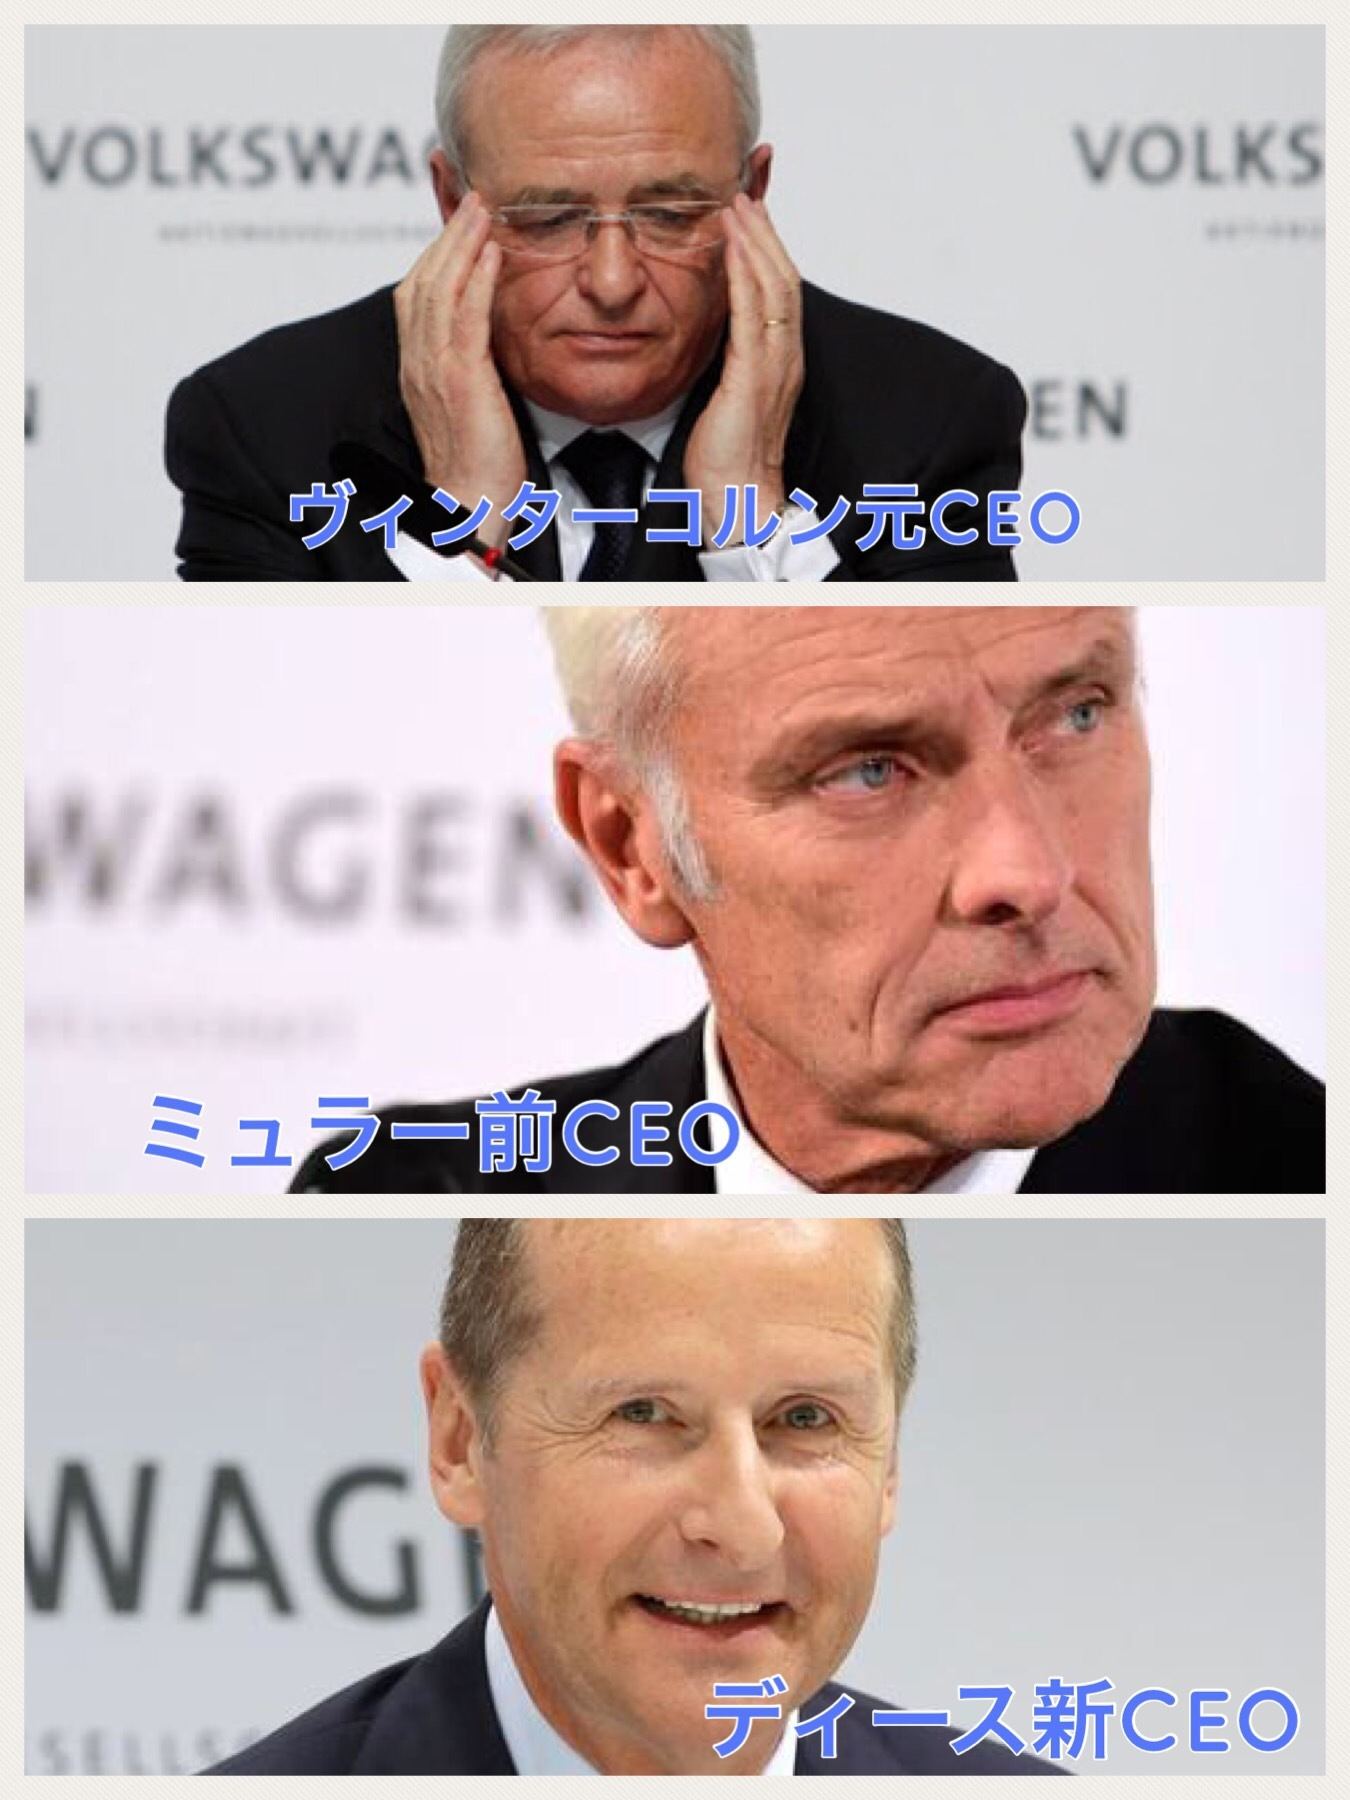 VW 新社長 ディース CEO